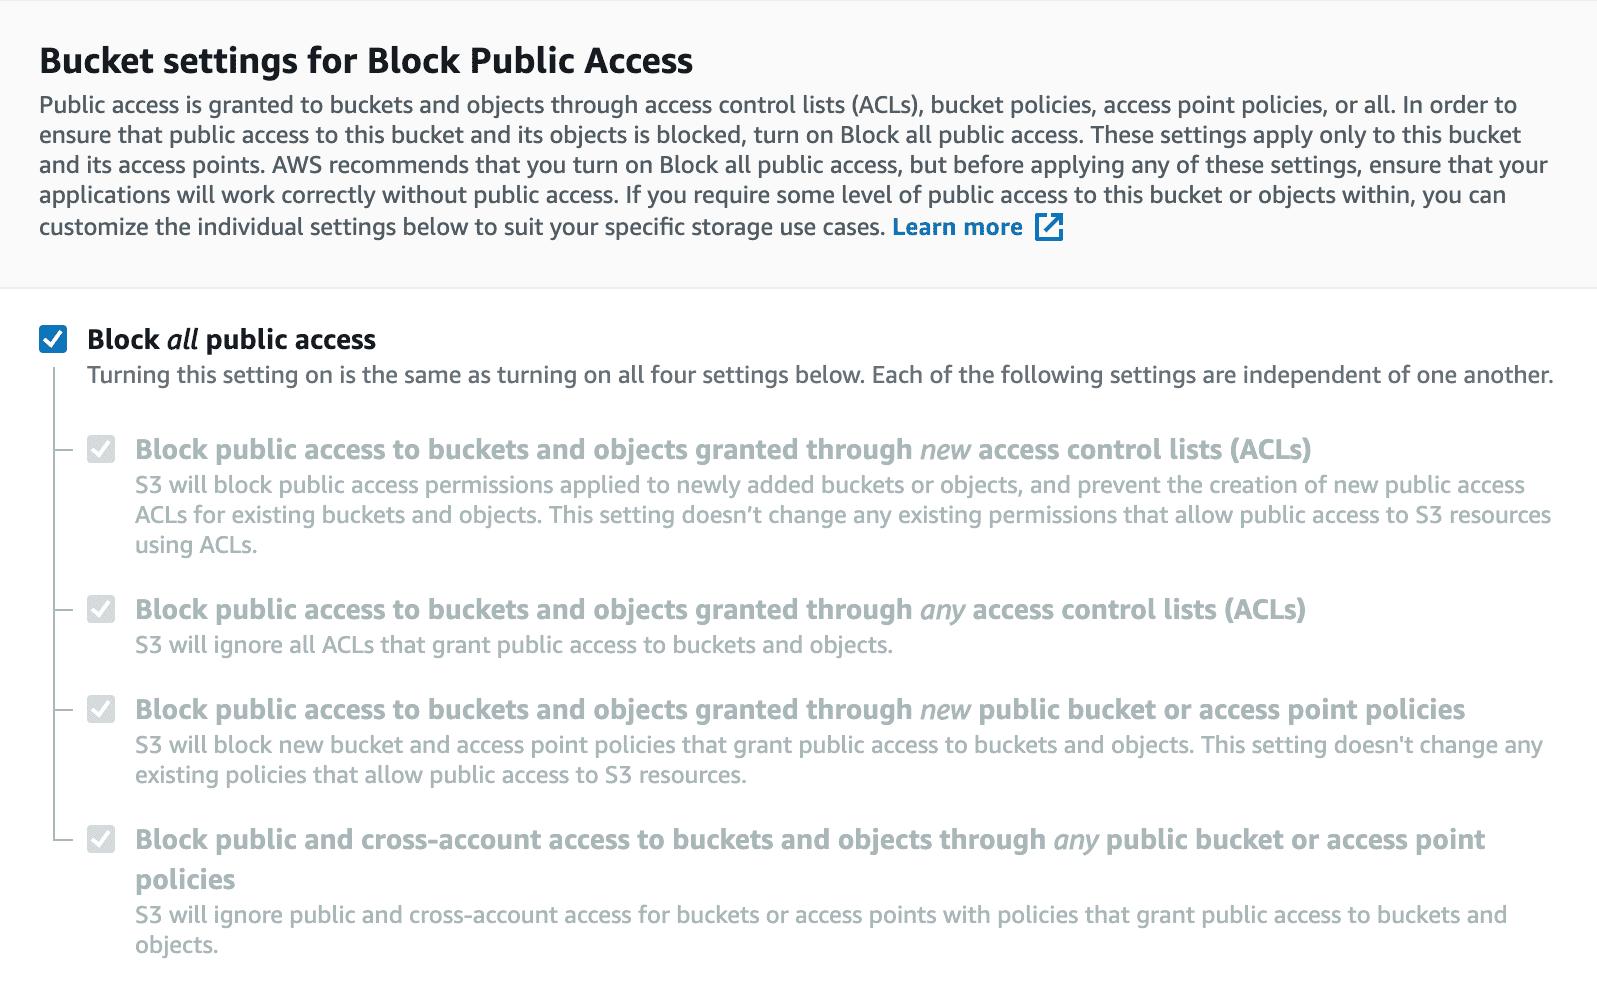 Bucket settings for public access